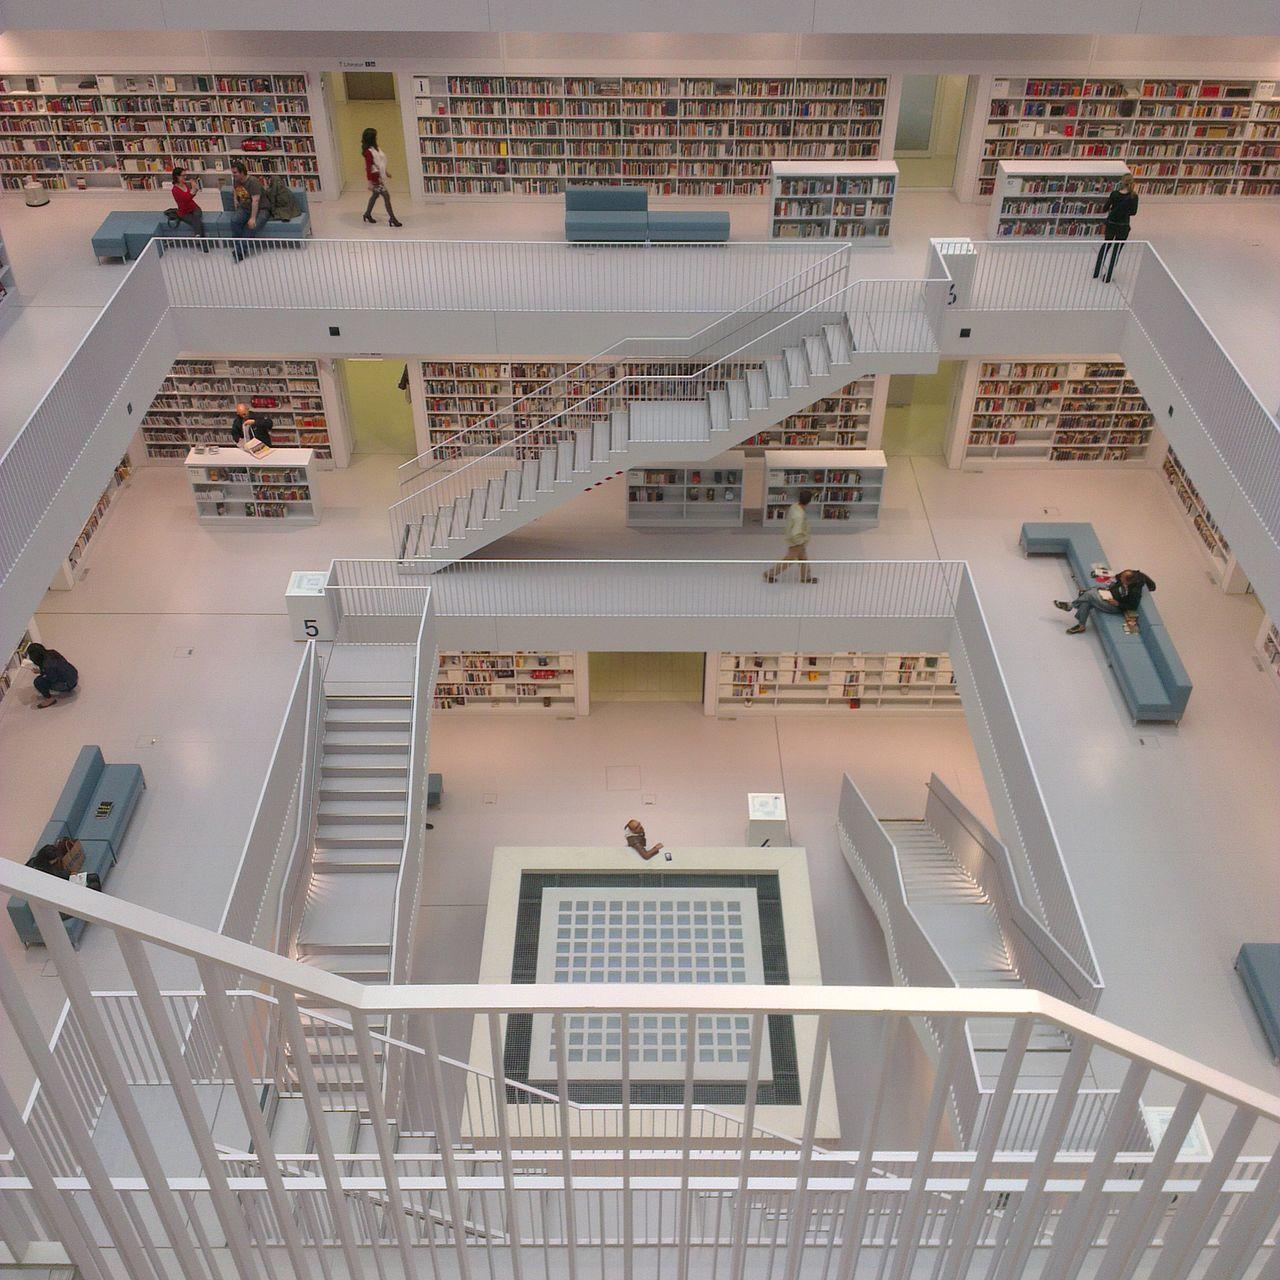 Instagood Architecture Biblioteca Bibliothek Stuttgart Stuttgartmobilephotographers Photooftheday Stuttgartshooters Wonderful Place Perfectview IndoorPhotography